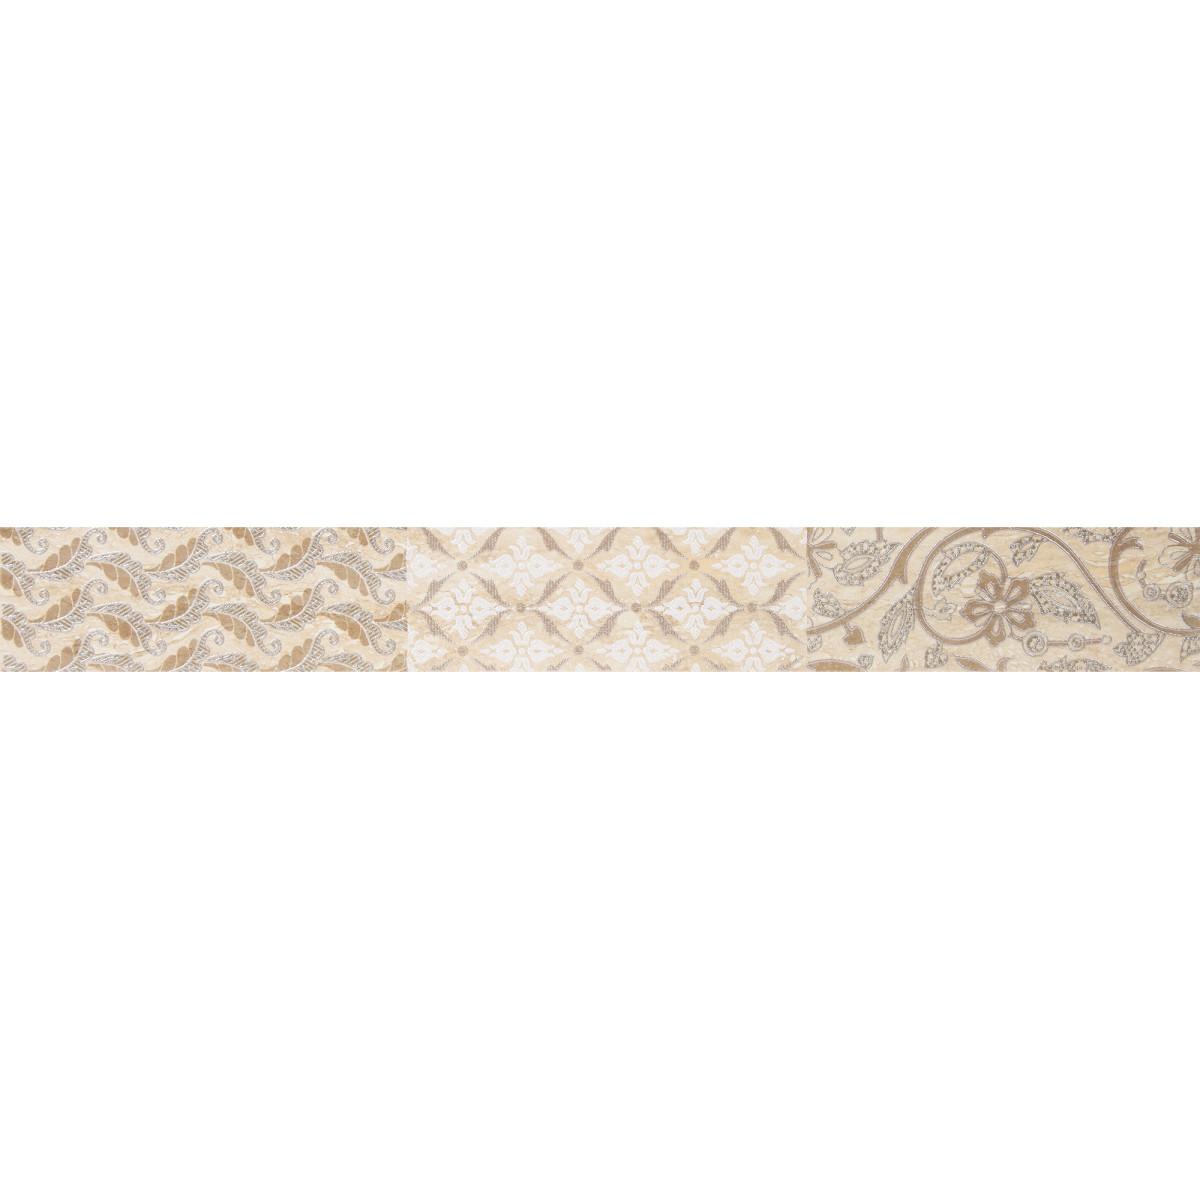 Бордюр «Marmi Classic» 50.5х6.2 см цвет бежевый